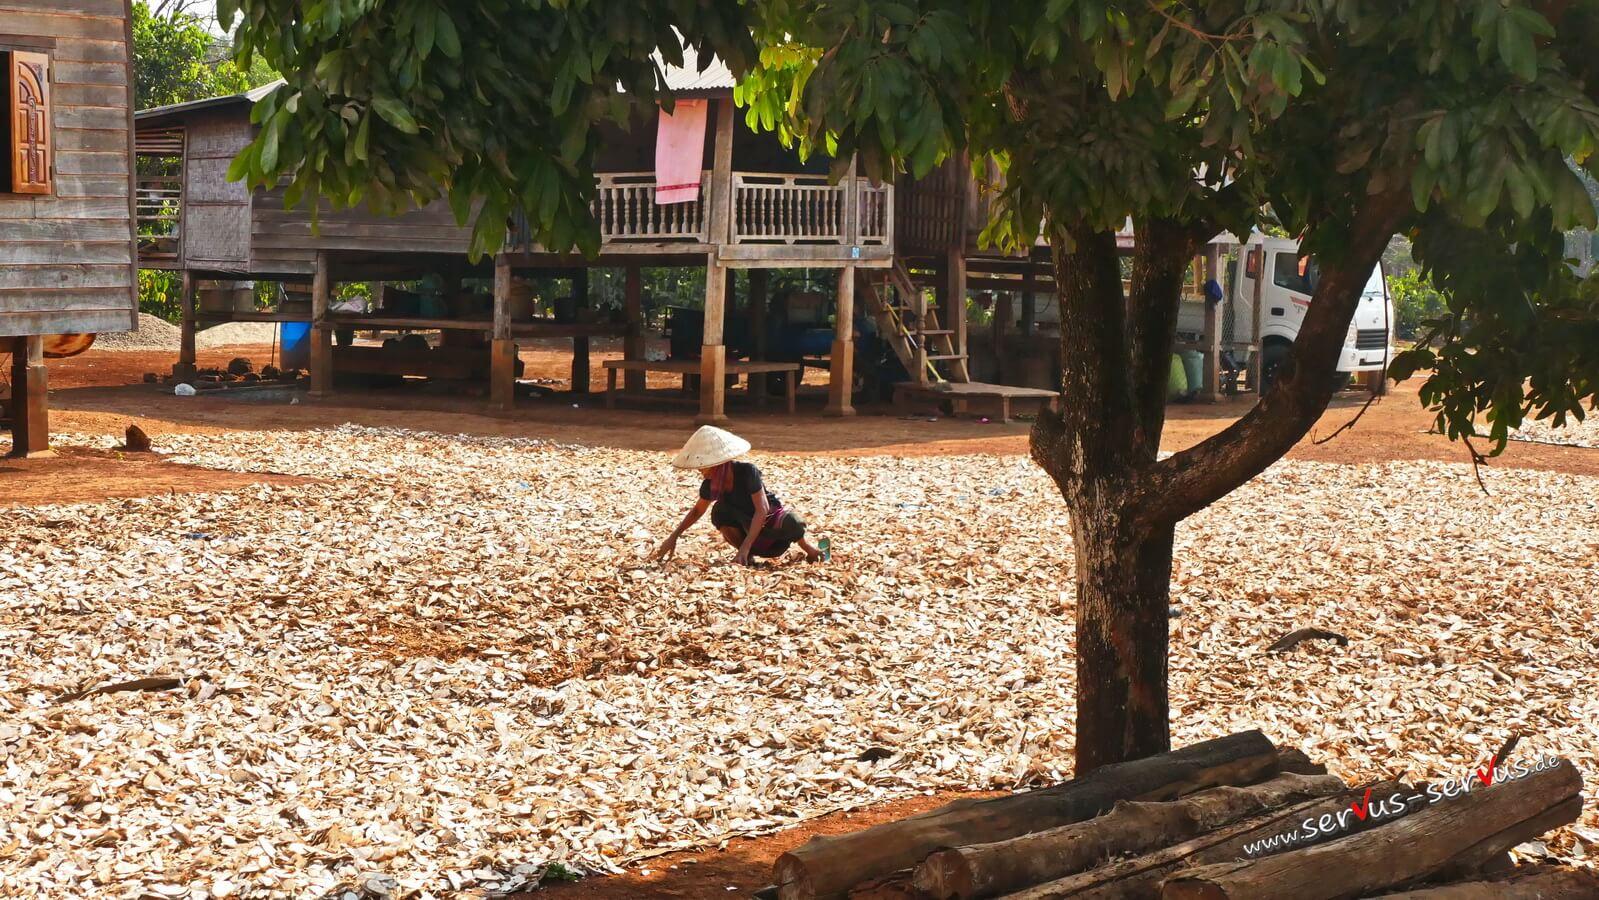 Boalvenplateau, Maniok wenden, Laos, Frau mit Strohhut